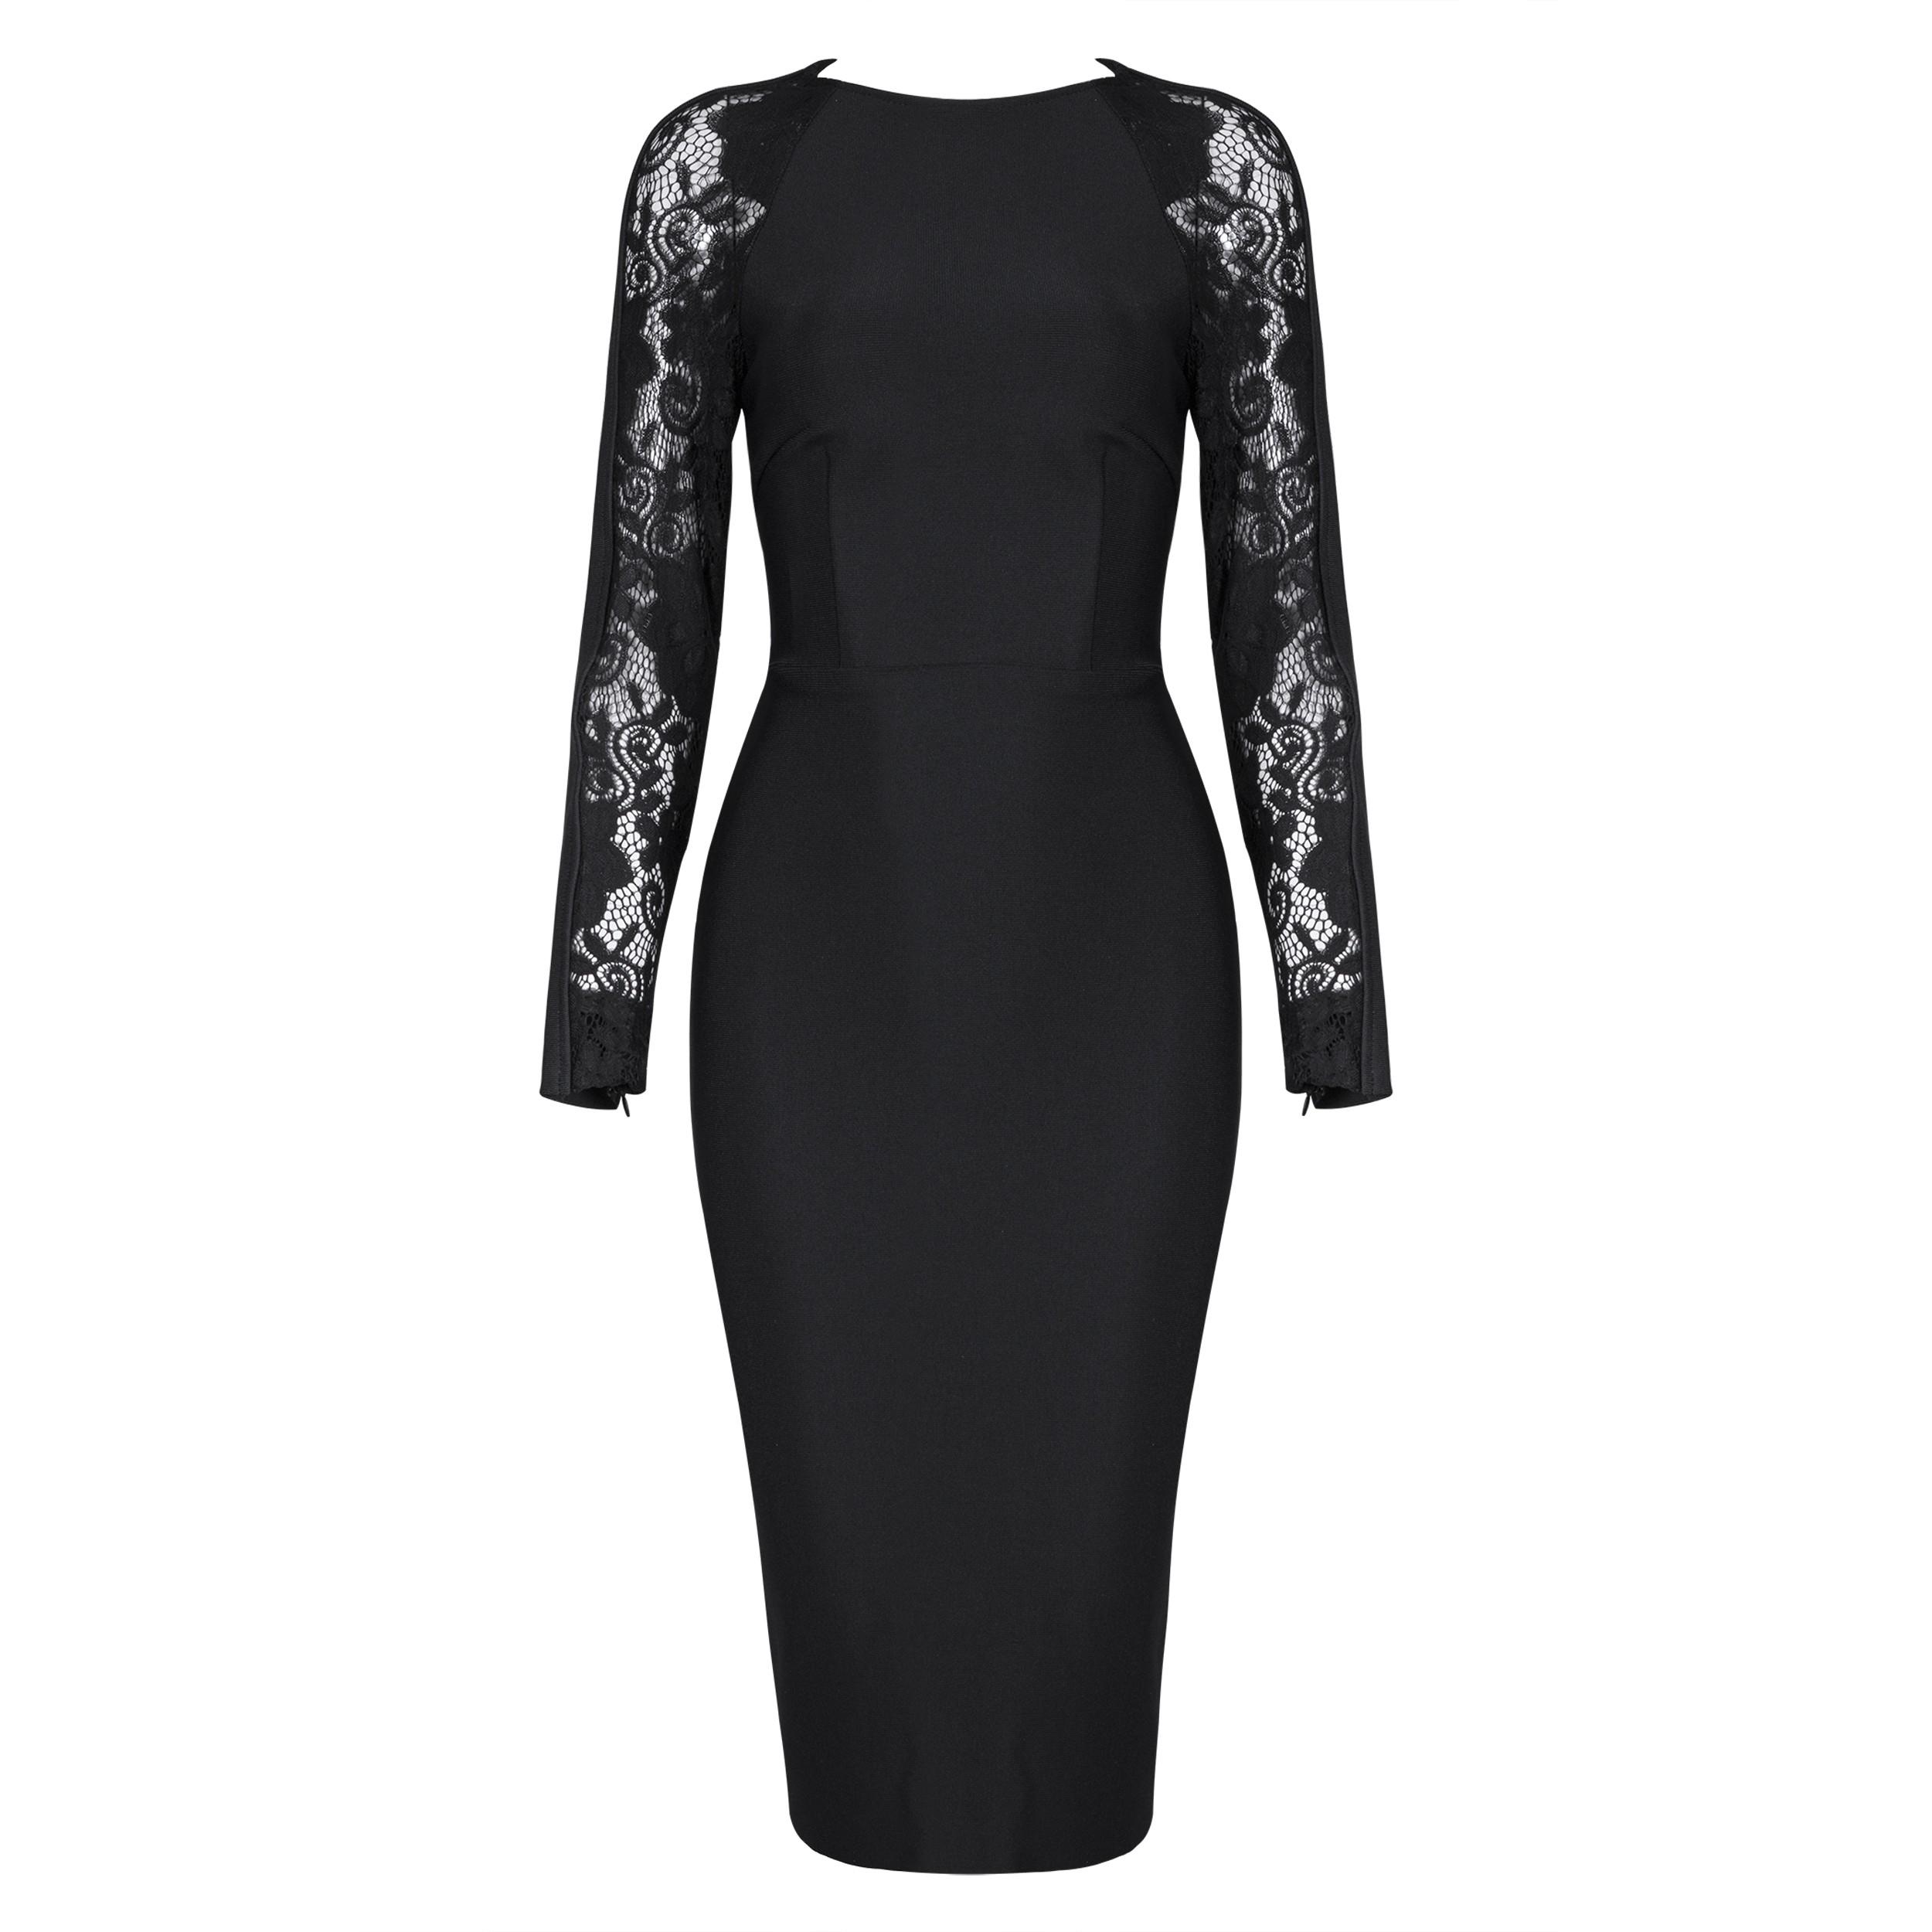 Black Round Neck 3/4 Sleeve Over Knee Lace Up High Quality Bandage Dress HB4438-Black